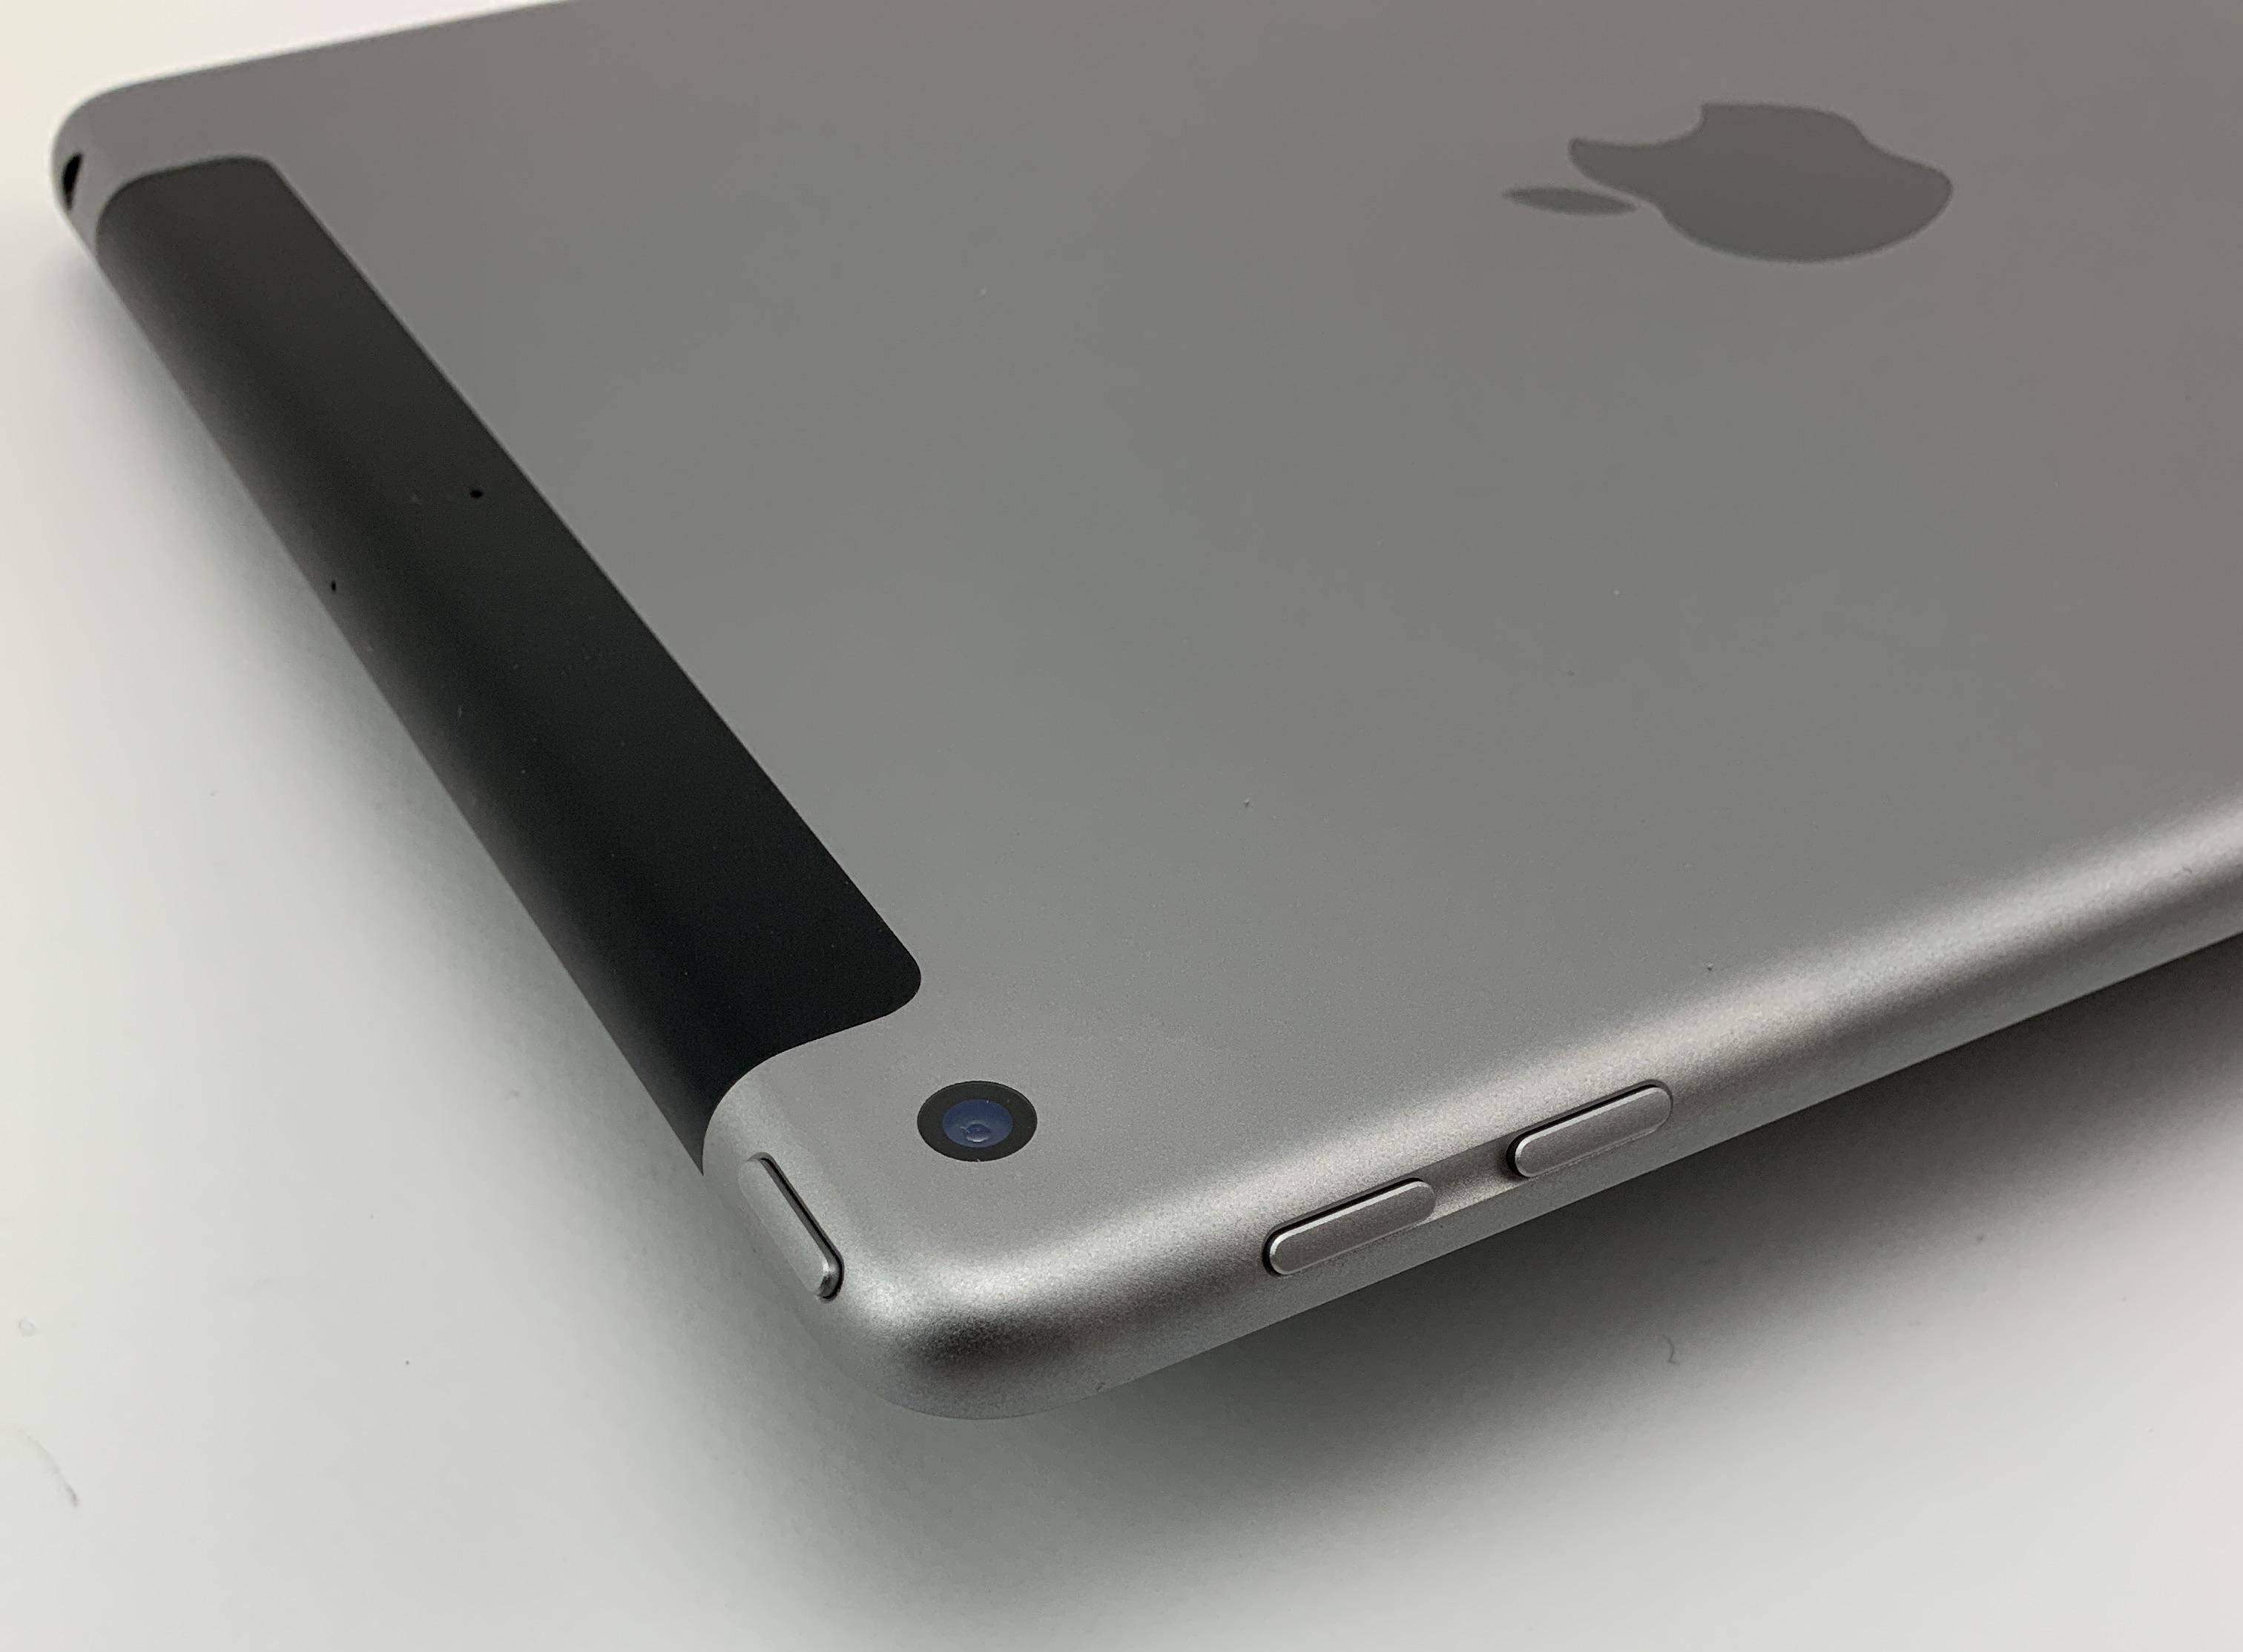 iPad 6 Wi-Fi + Cellular 128GB, 128GB, Space Gray, imagen 3